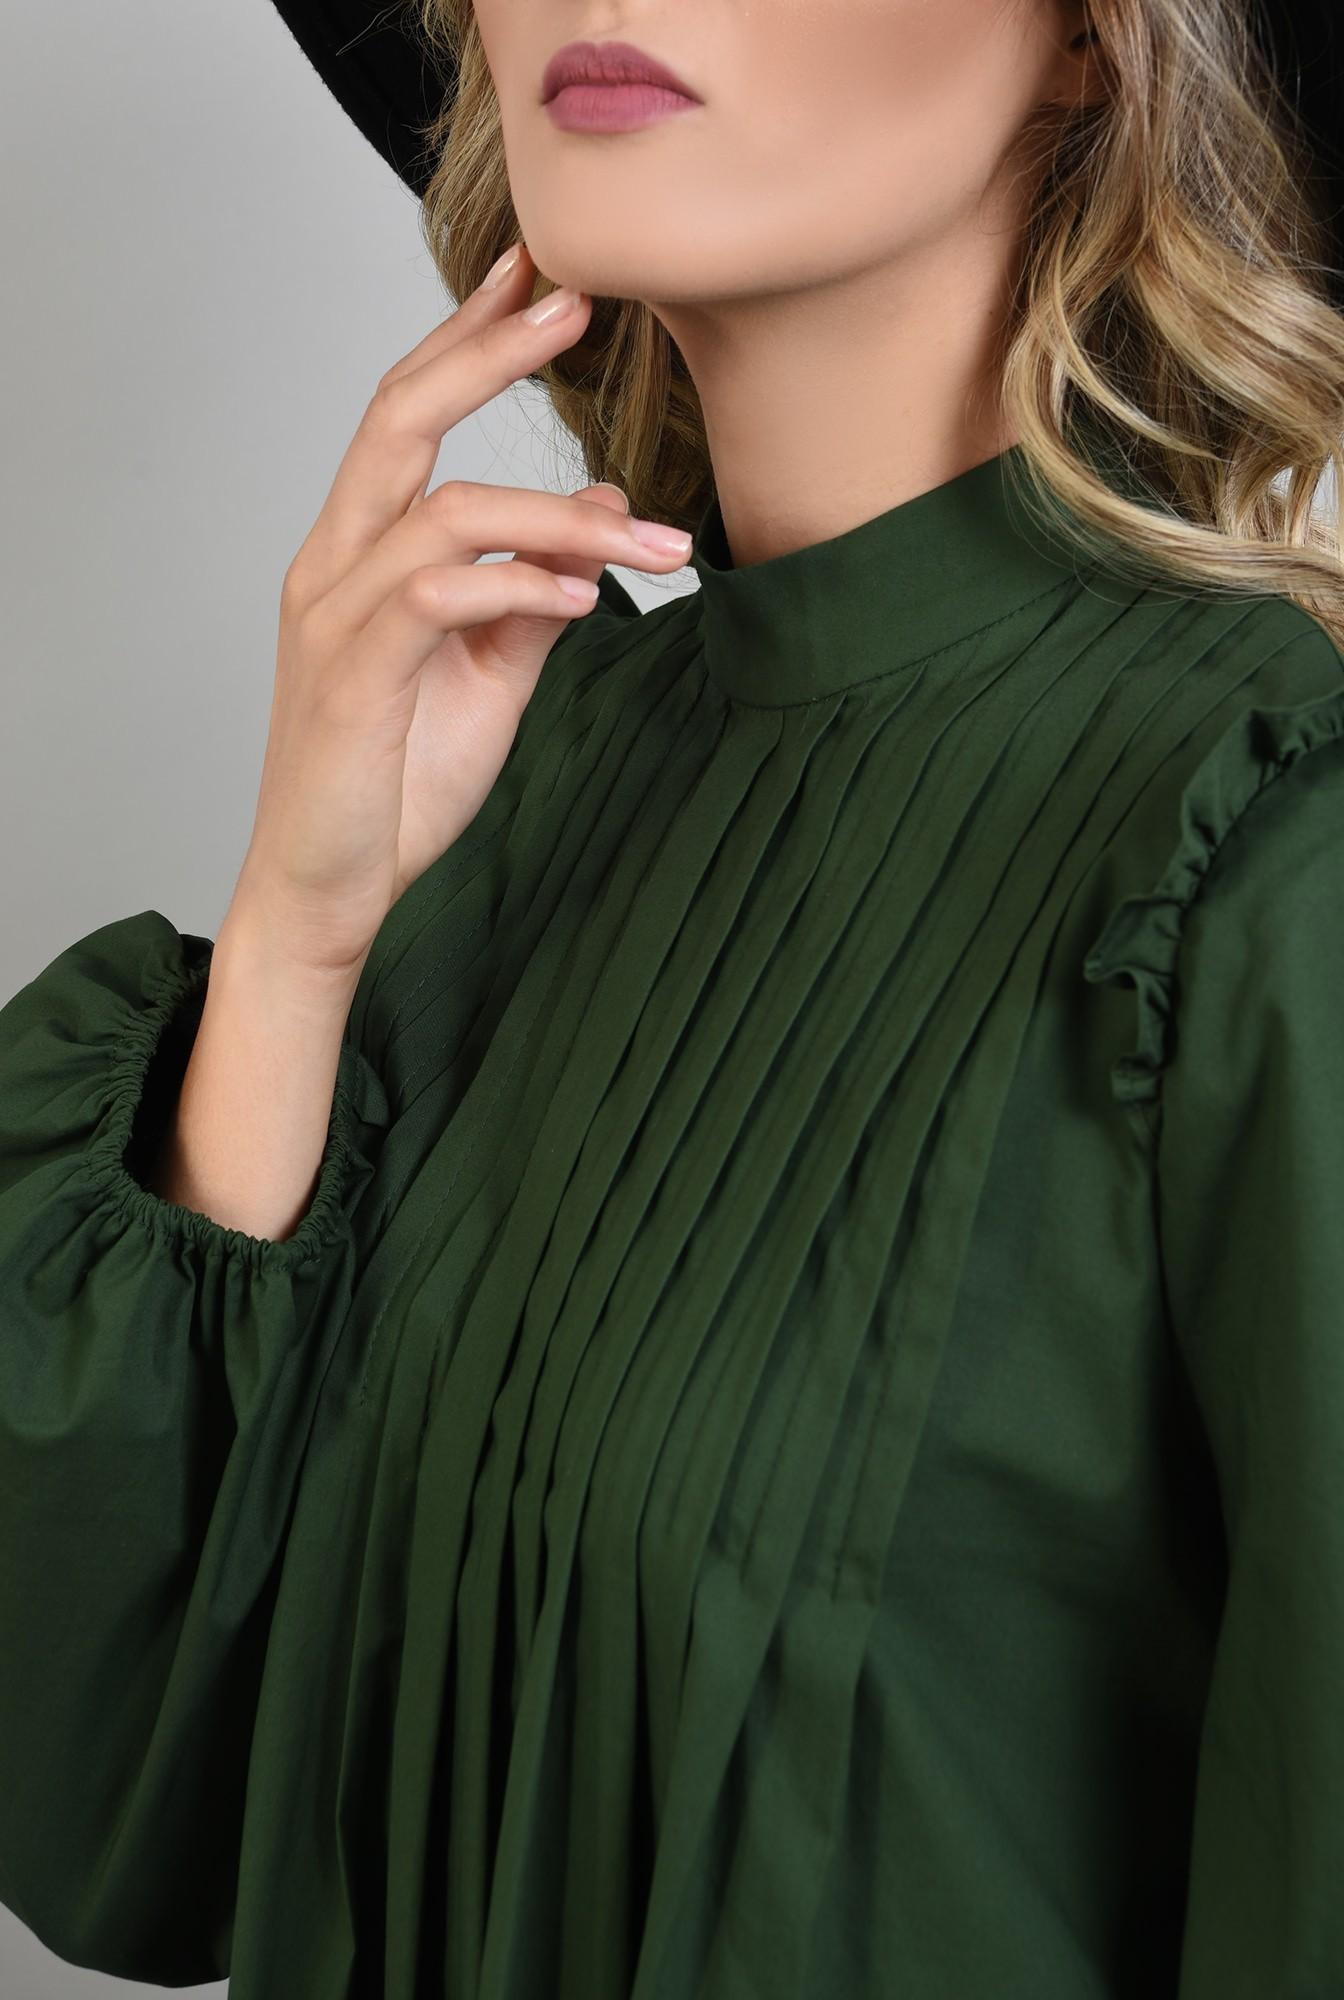 2 - 360 - rochie verde, din bumbac, cu pliuri decorative, maneci bufante